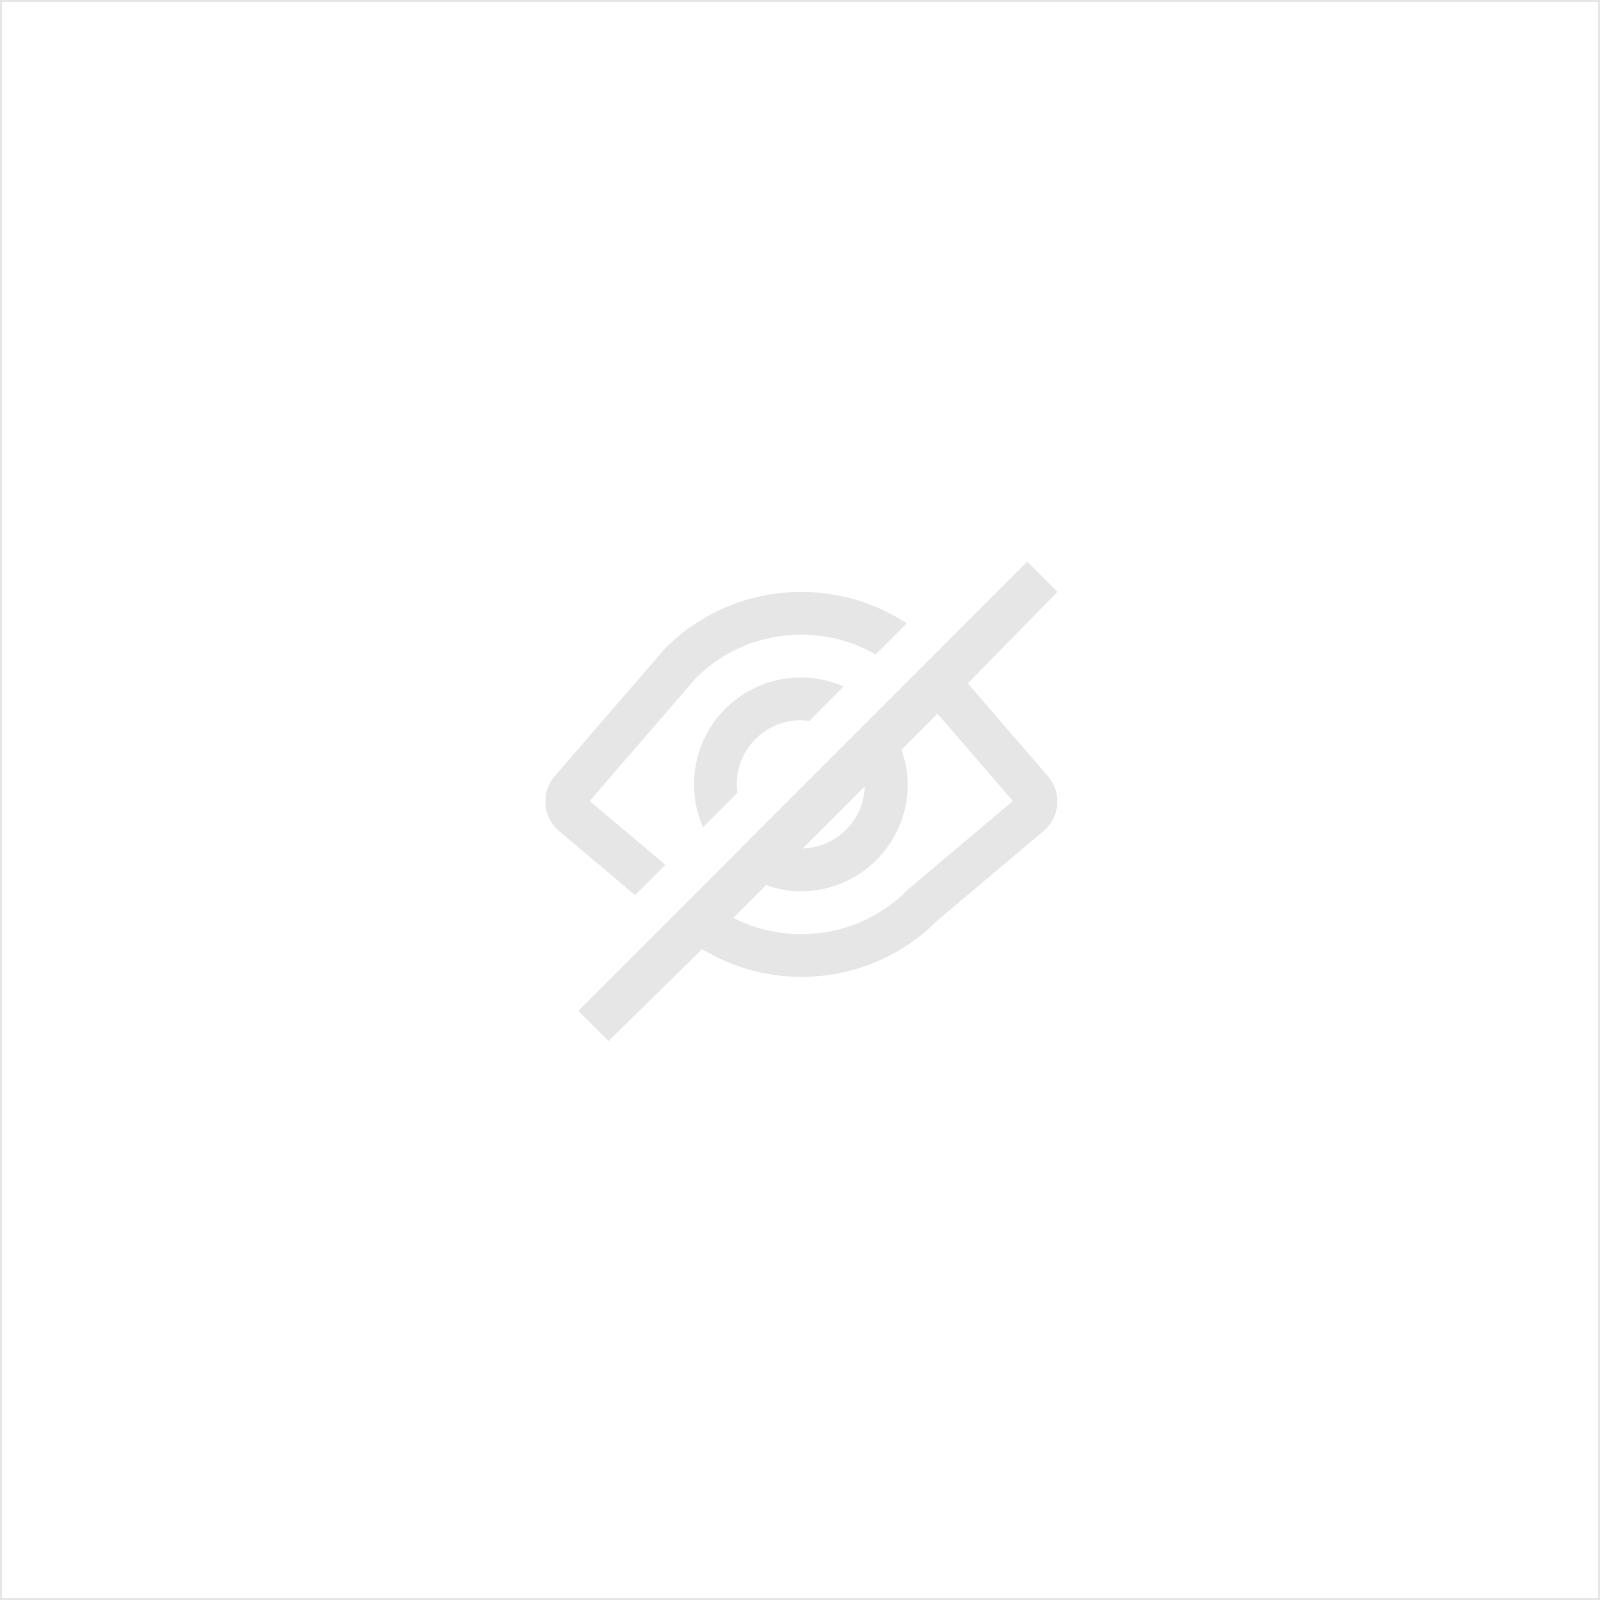 STRAALMIDDEL NATRIUMCARBONAAT SODA 0,10 - 0,30 MM 25 KG